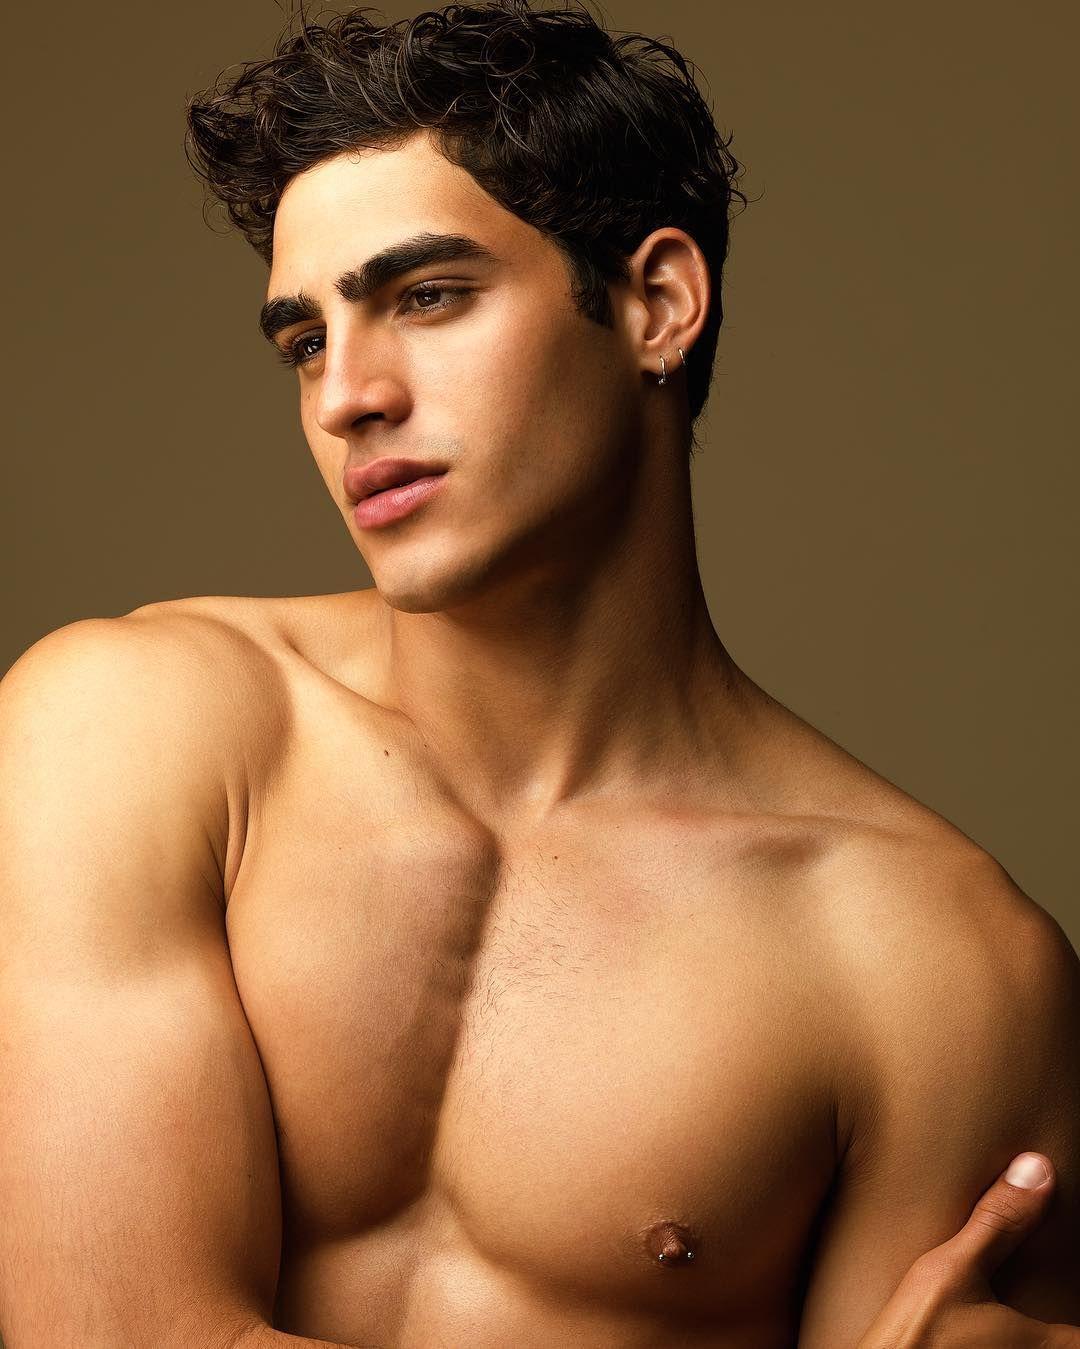 Jhonattan Burjack Nude jhon burjack | best face products, beautiful men, face men